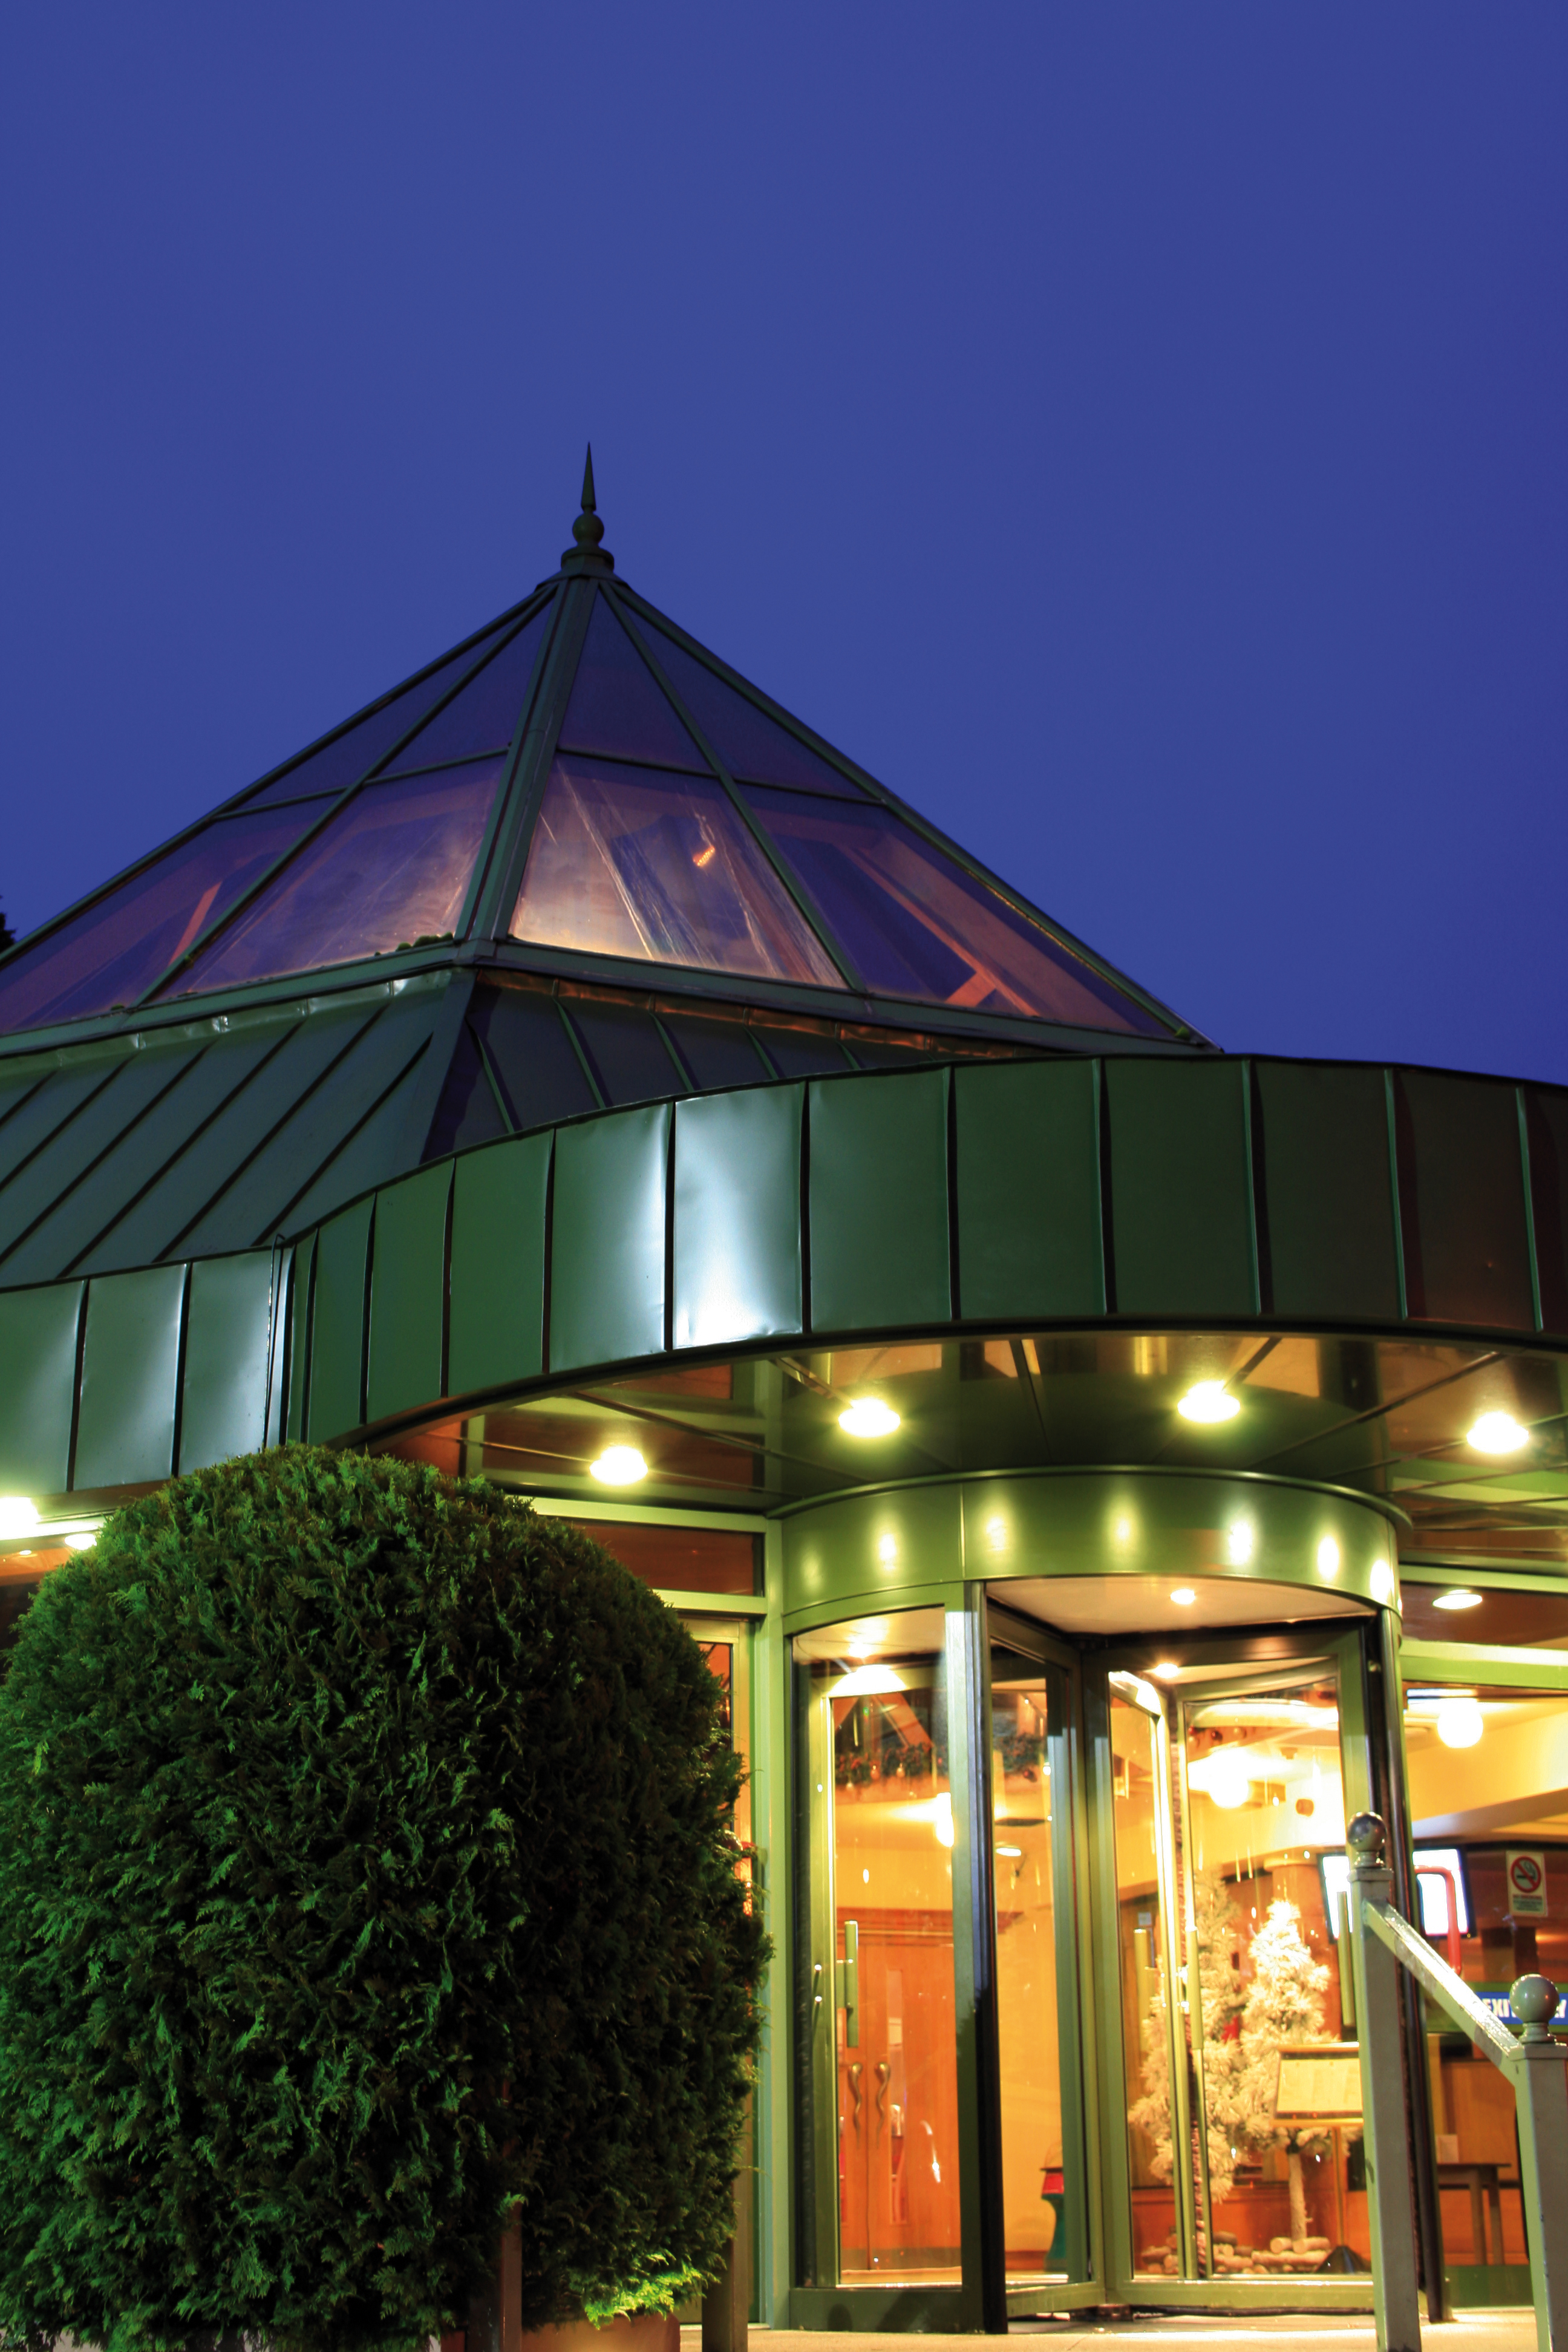 The Silverbirch Hotel